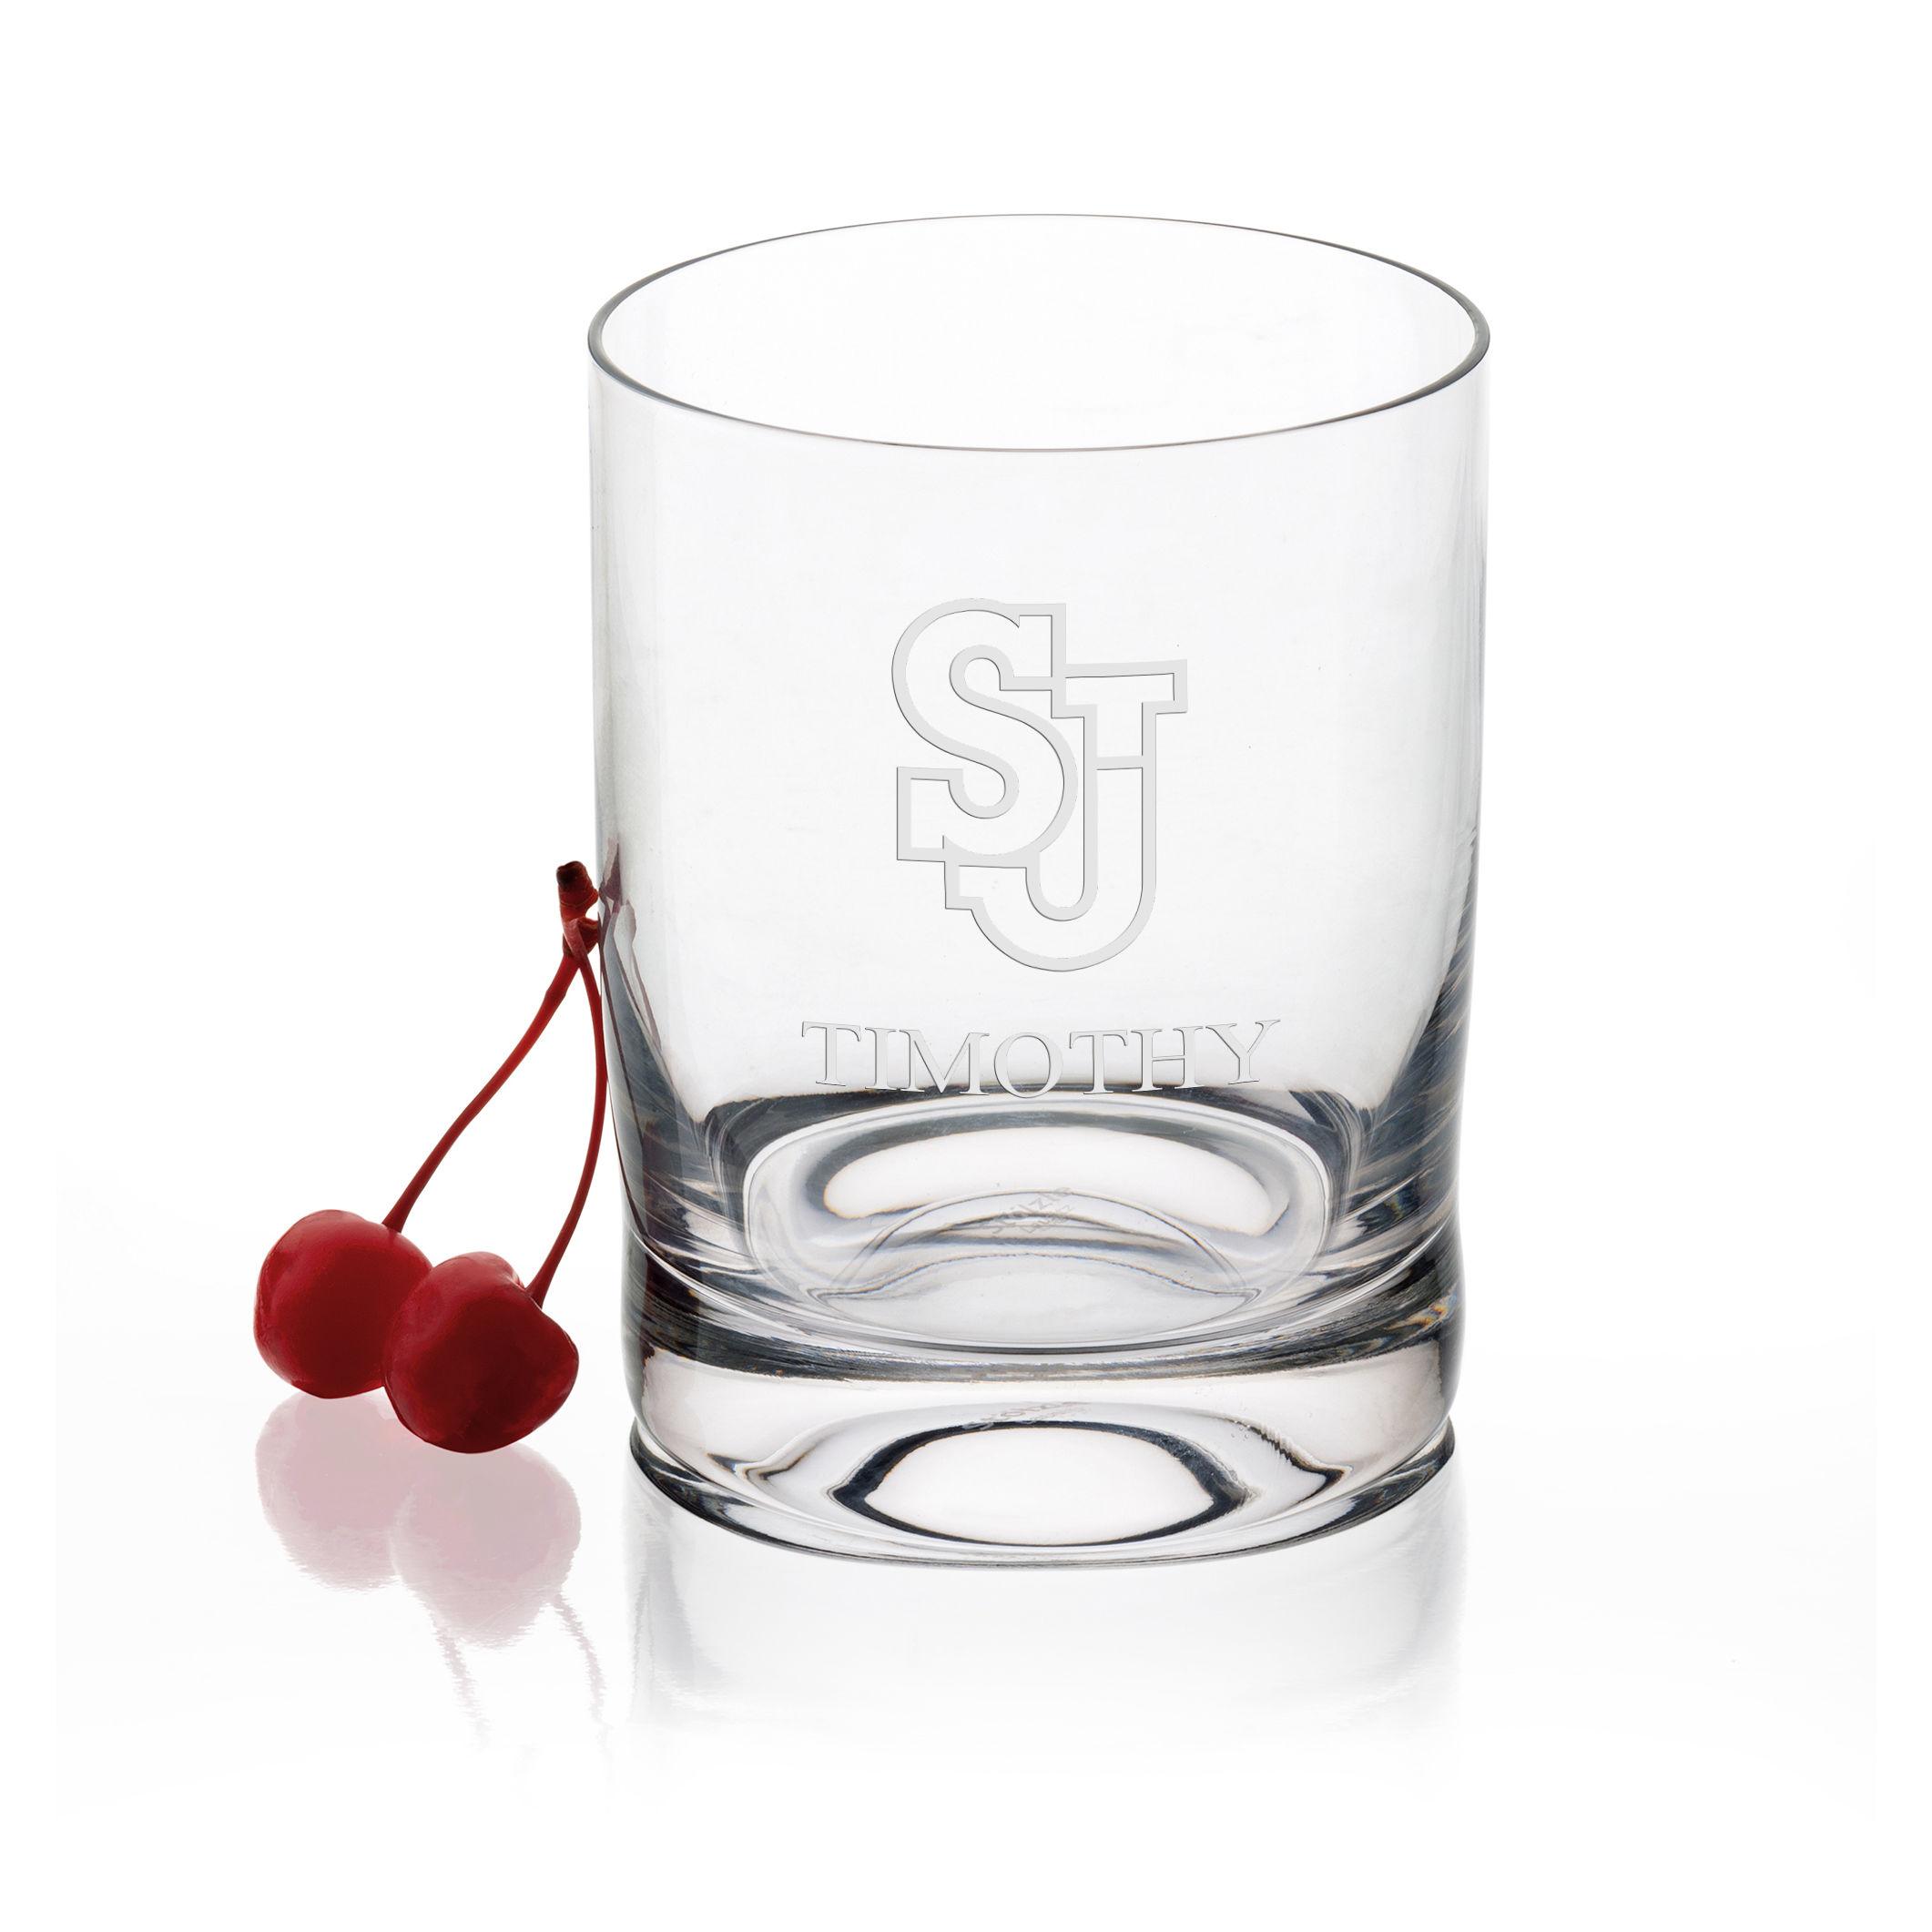 St. John's University Tumbler Glasses - Set of 2